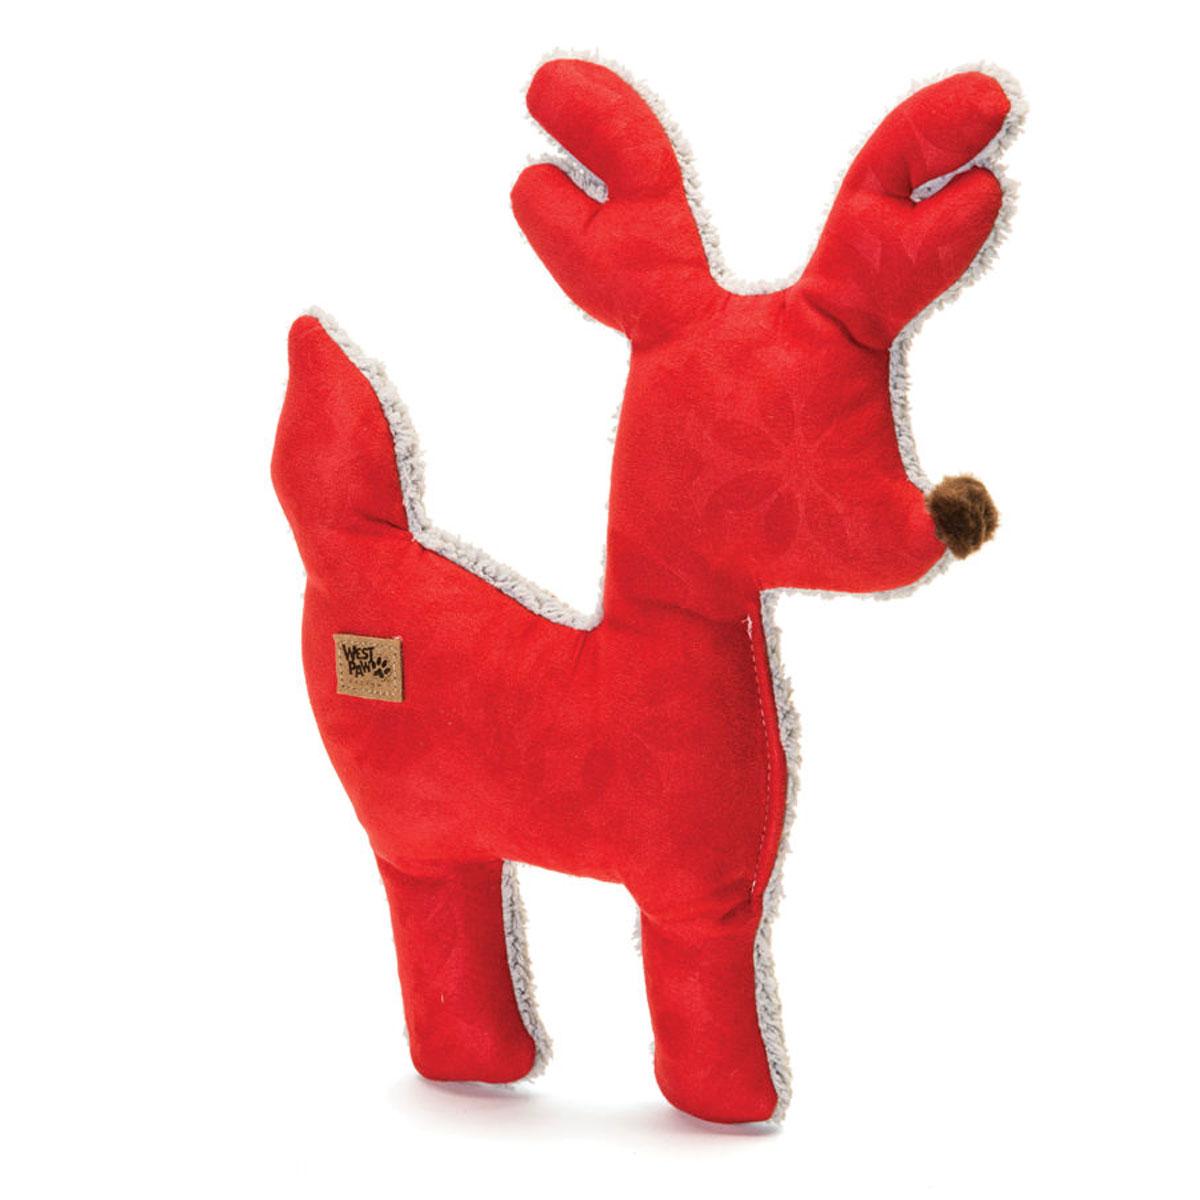 Big Sky Reindeer Holiday Dog Toy - Crimson